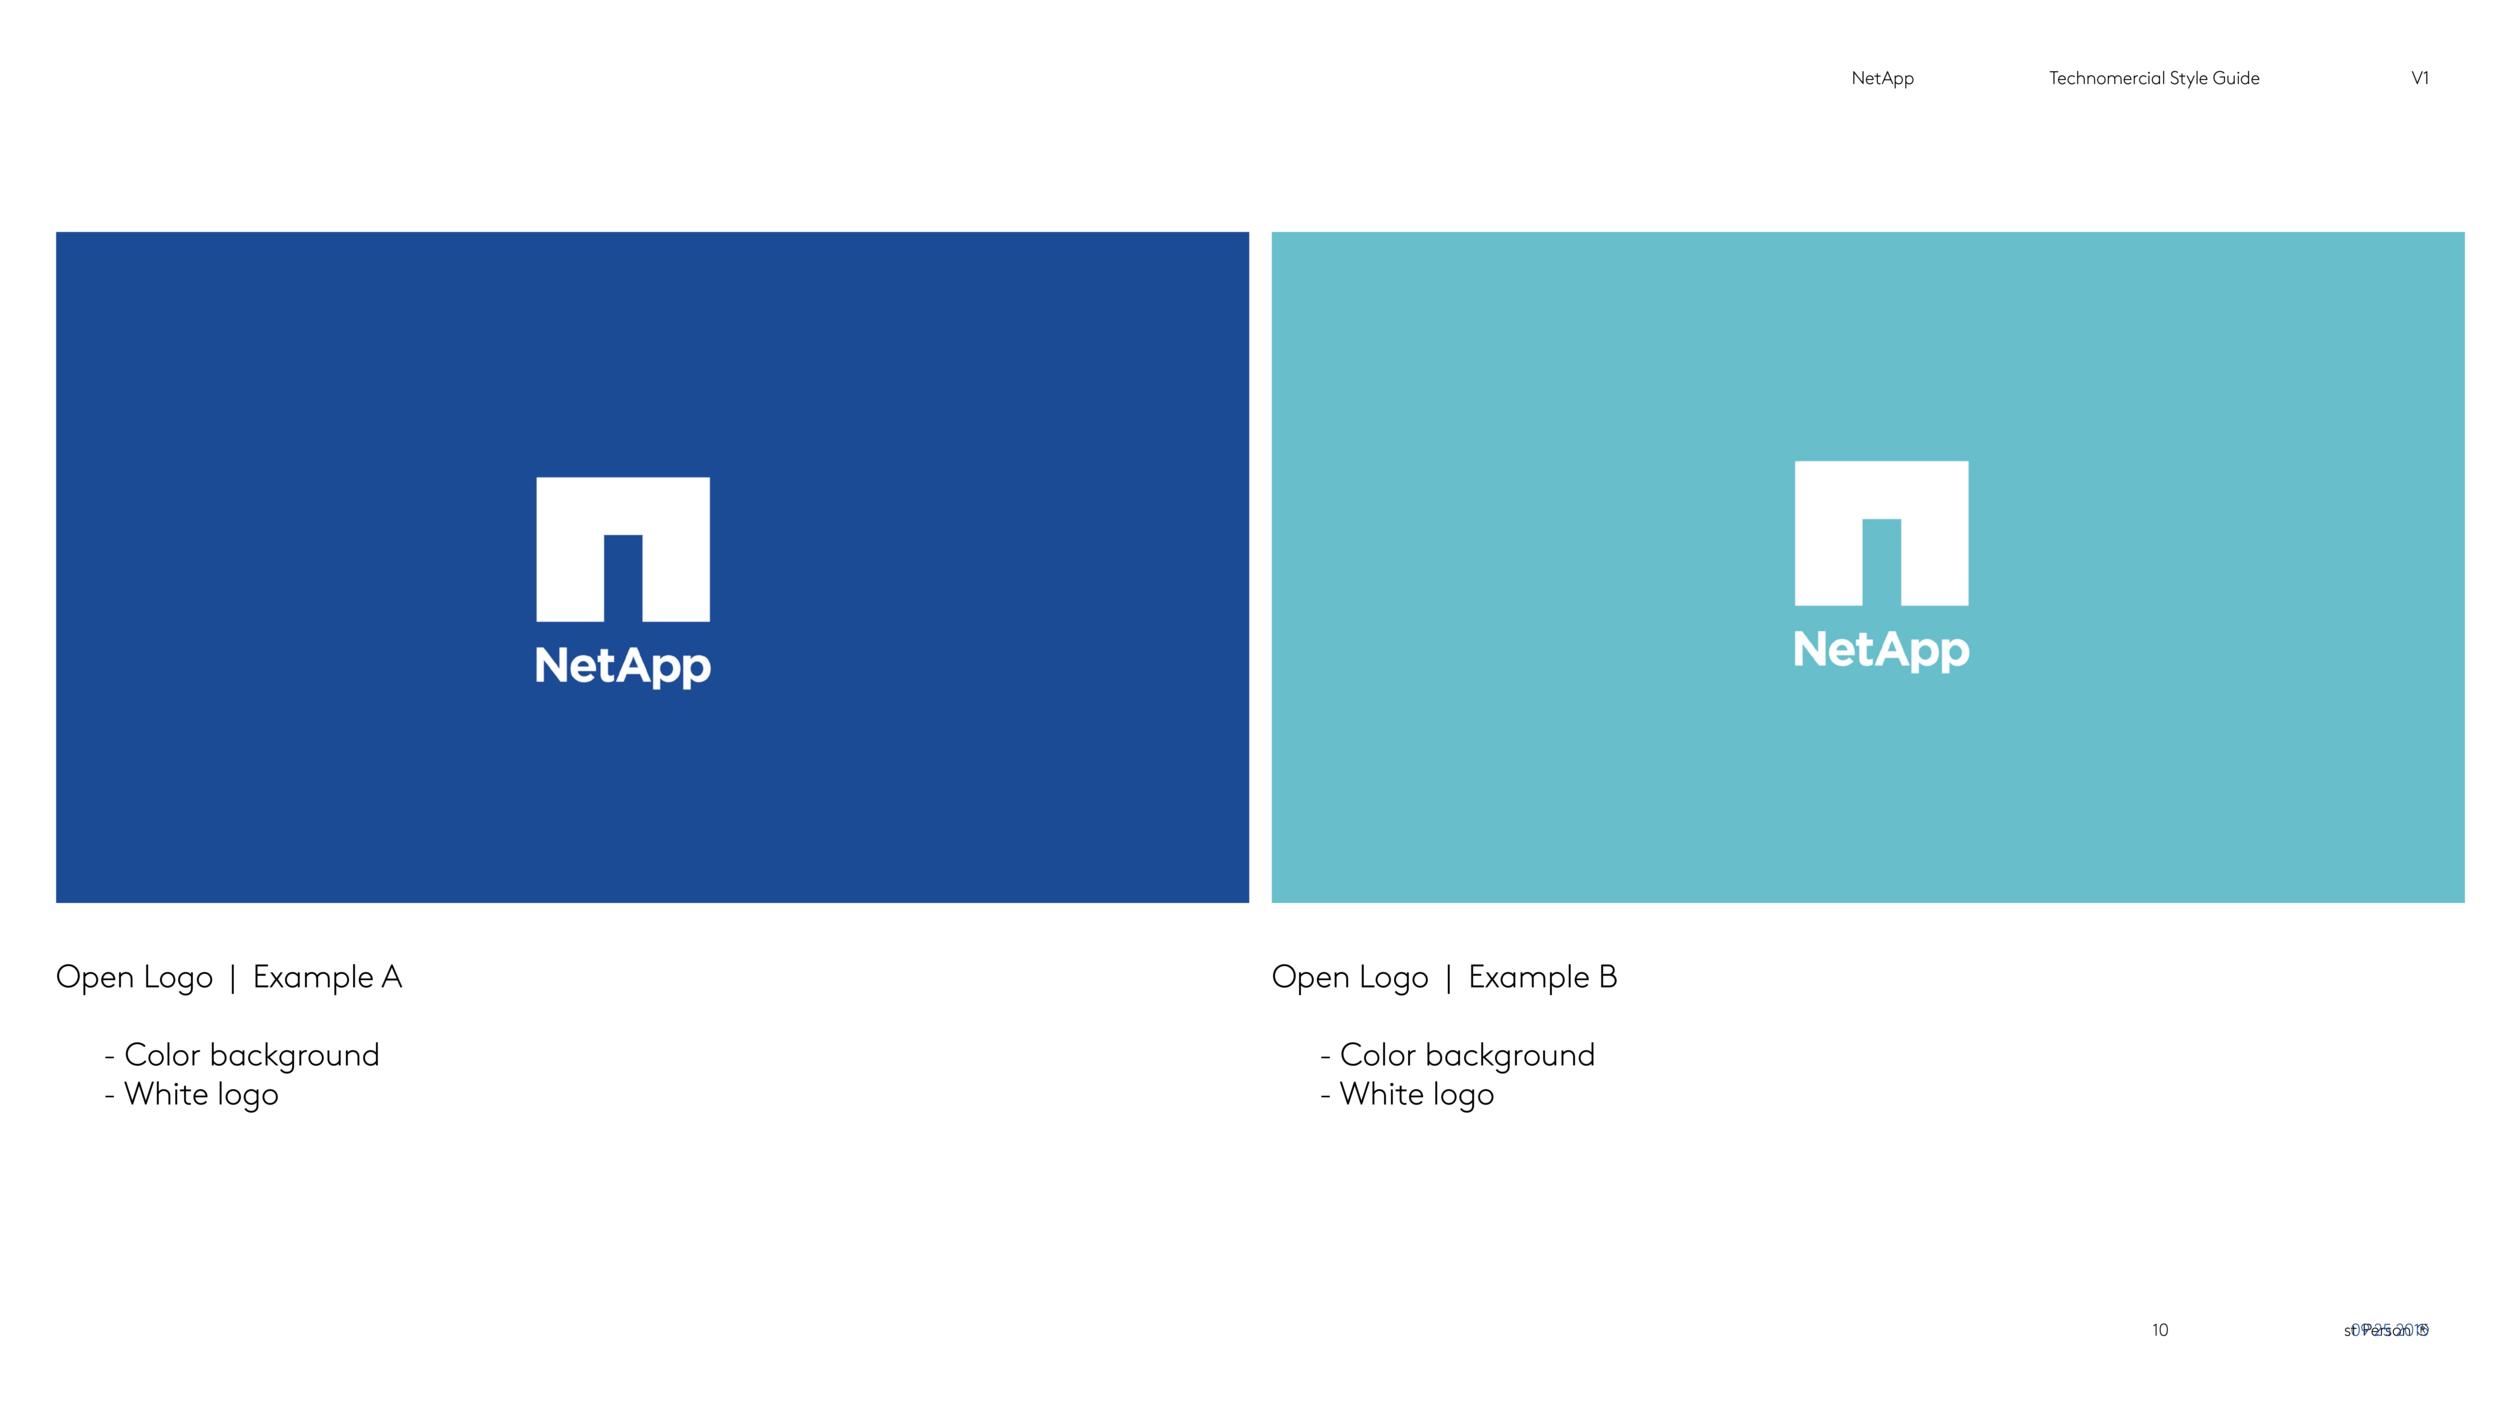 NetApp_Technomercial_Guidelines_01-10.png